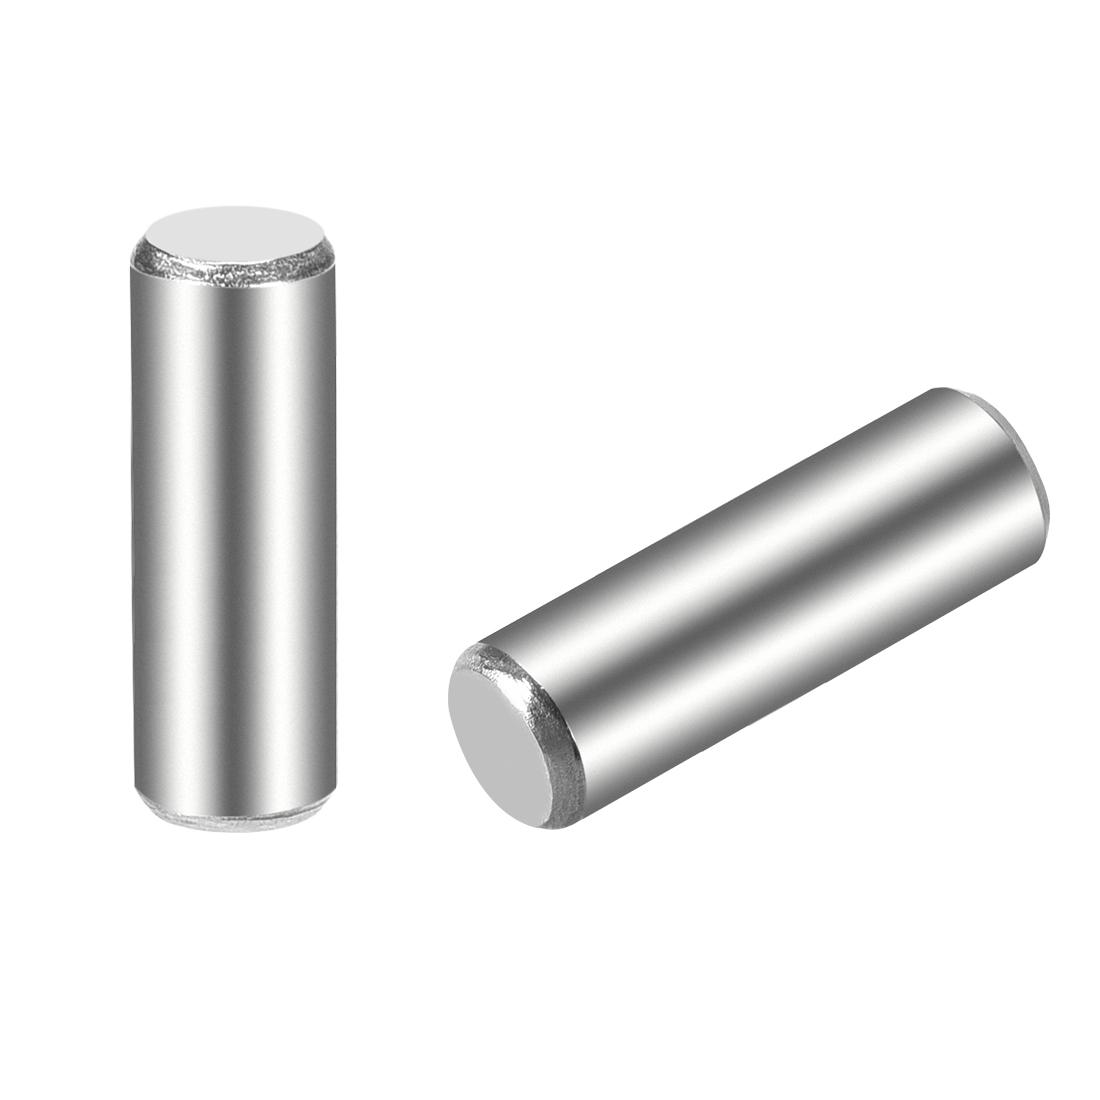 15Pcs 5mm x 16mm Dowel Pin 304 Stainless Steel Shelf Support Pin Fasten